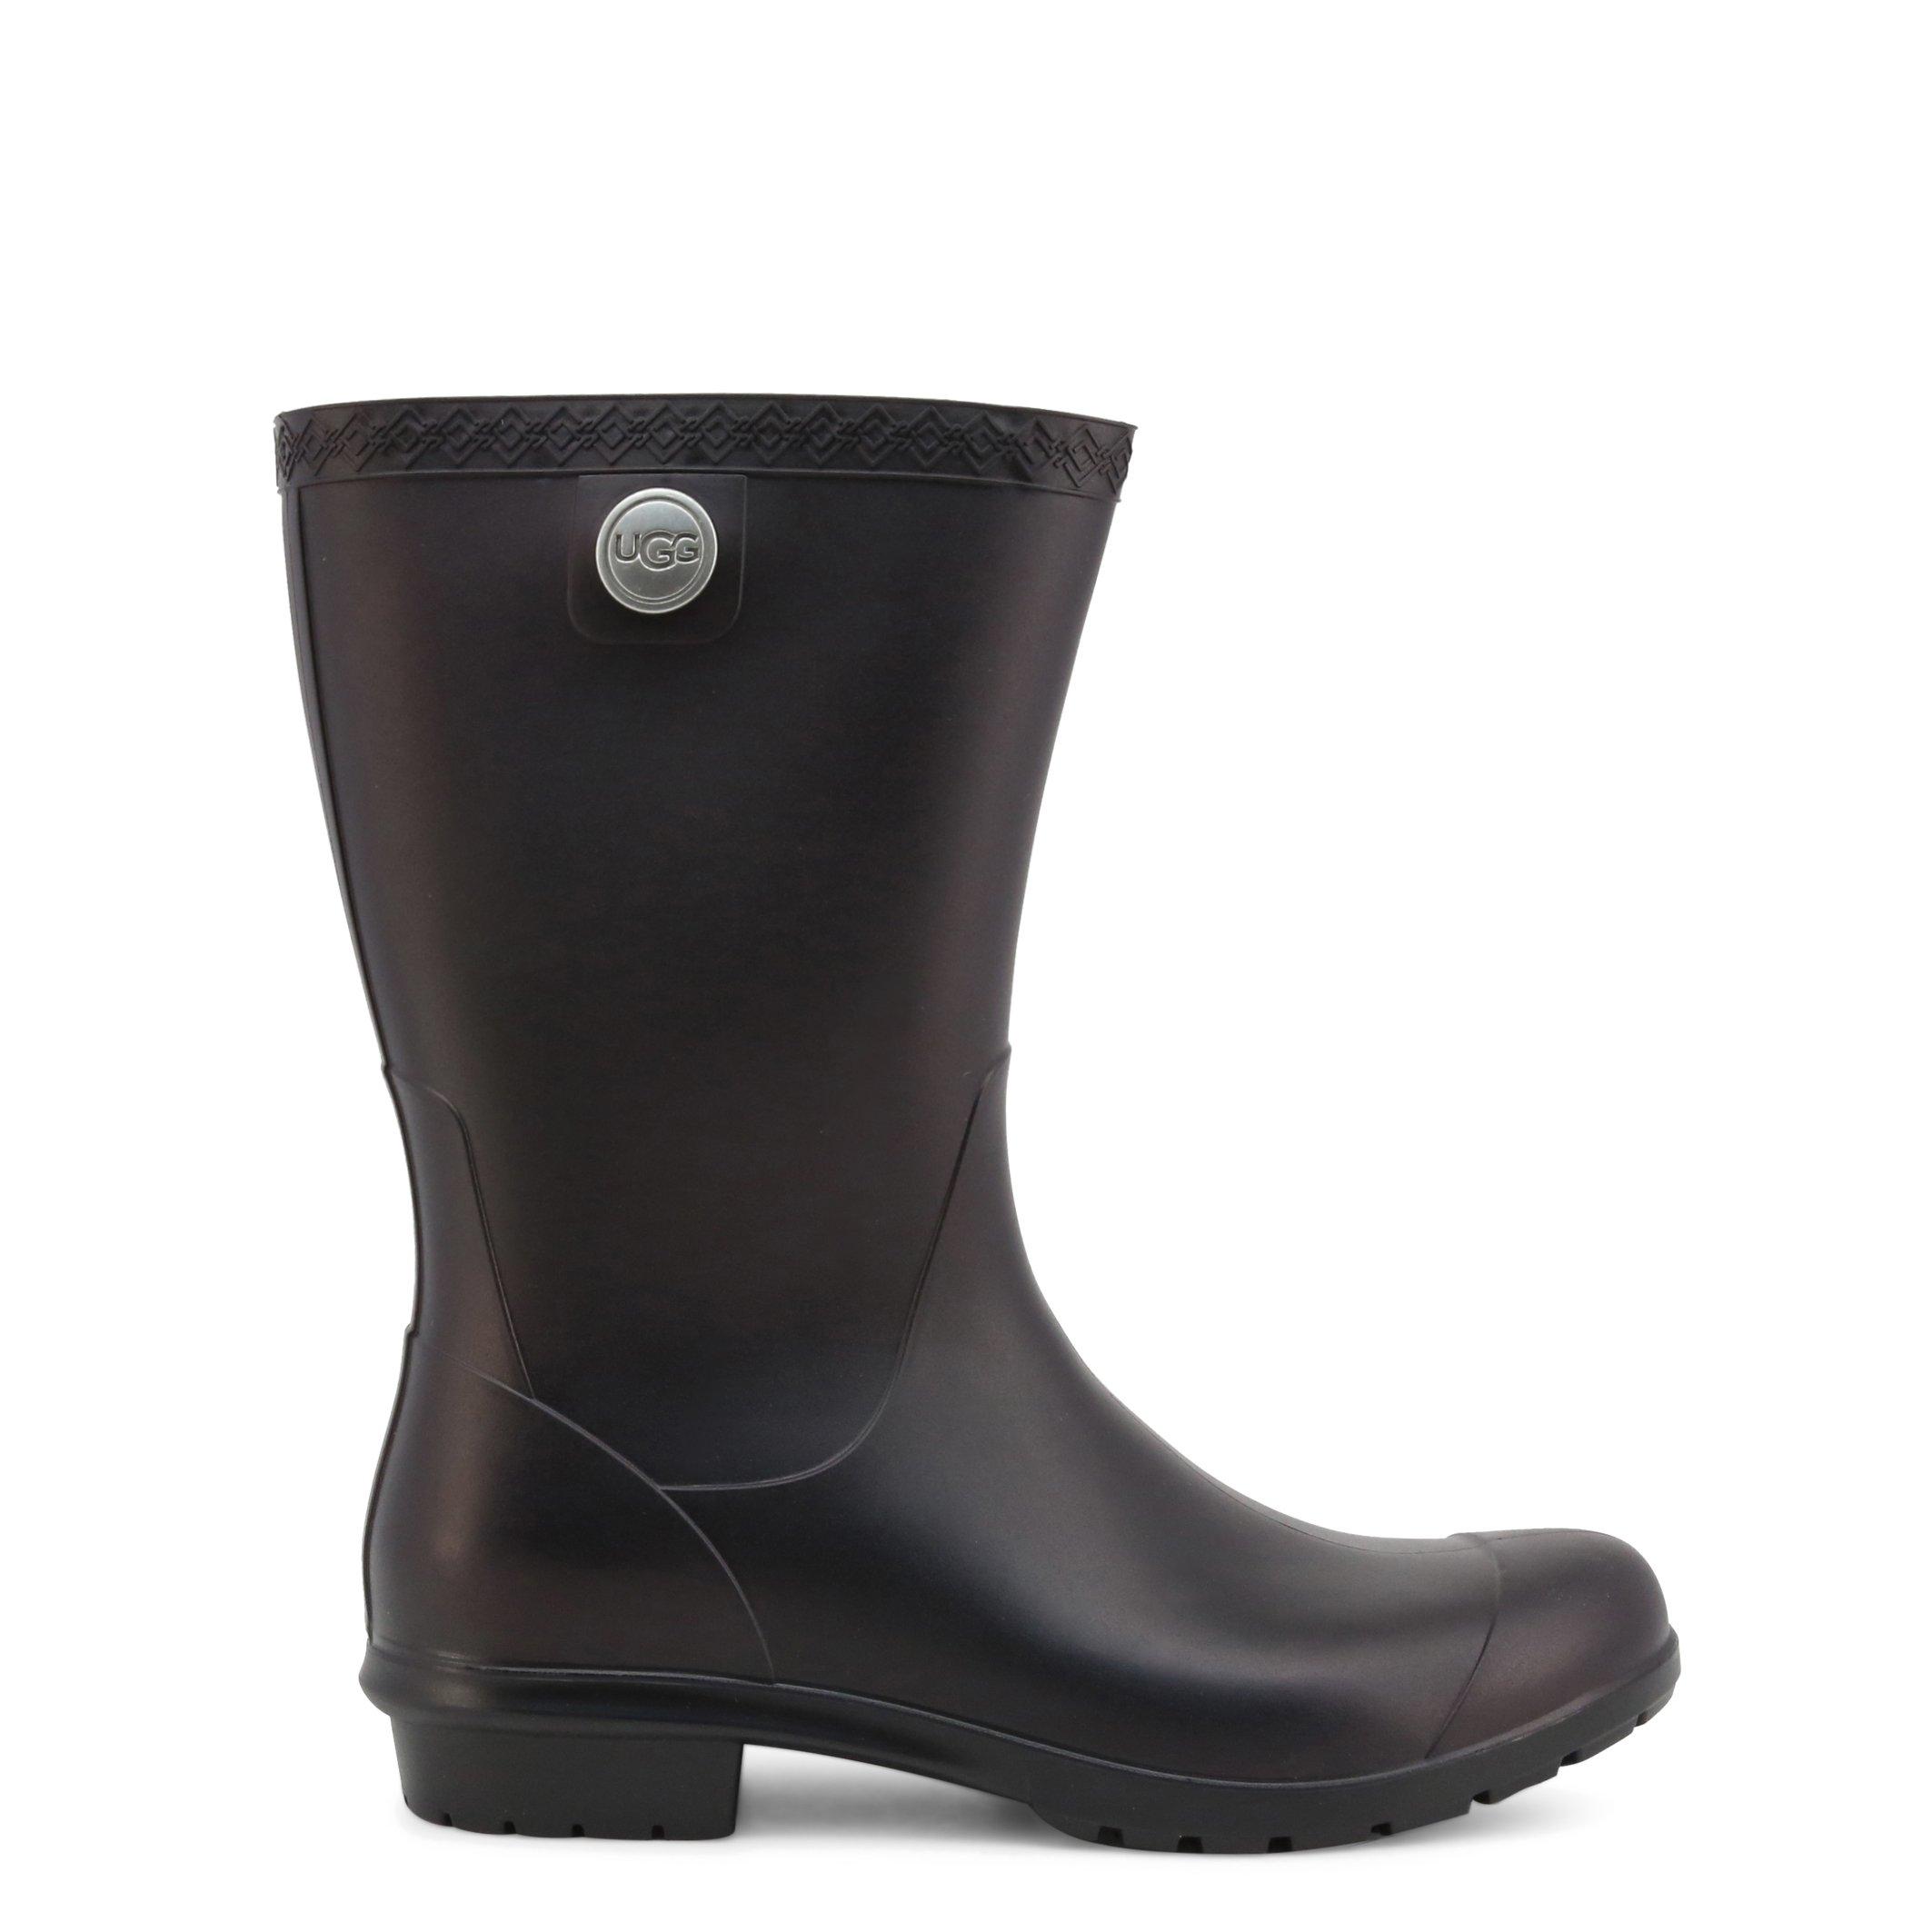 UGG Women's Ankle Boot Various Colours 1100510 - black EU 38